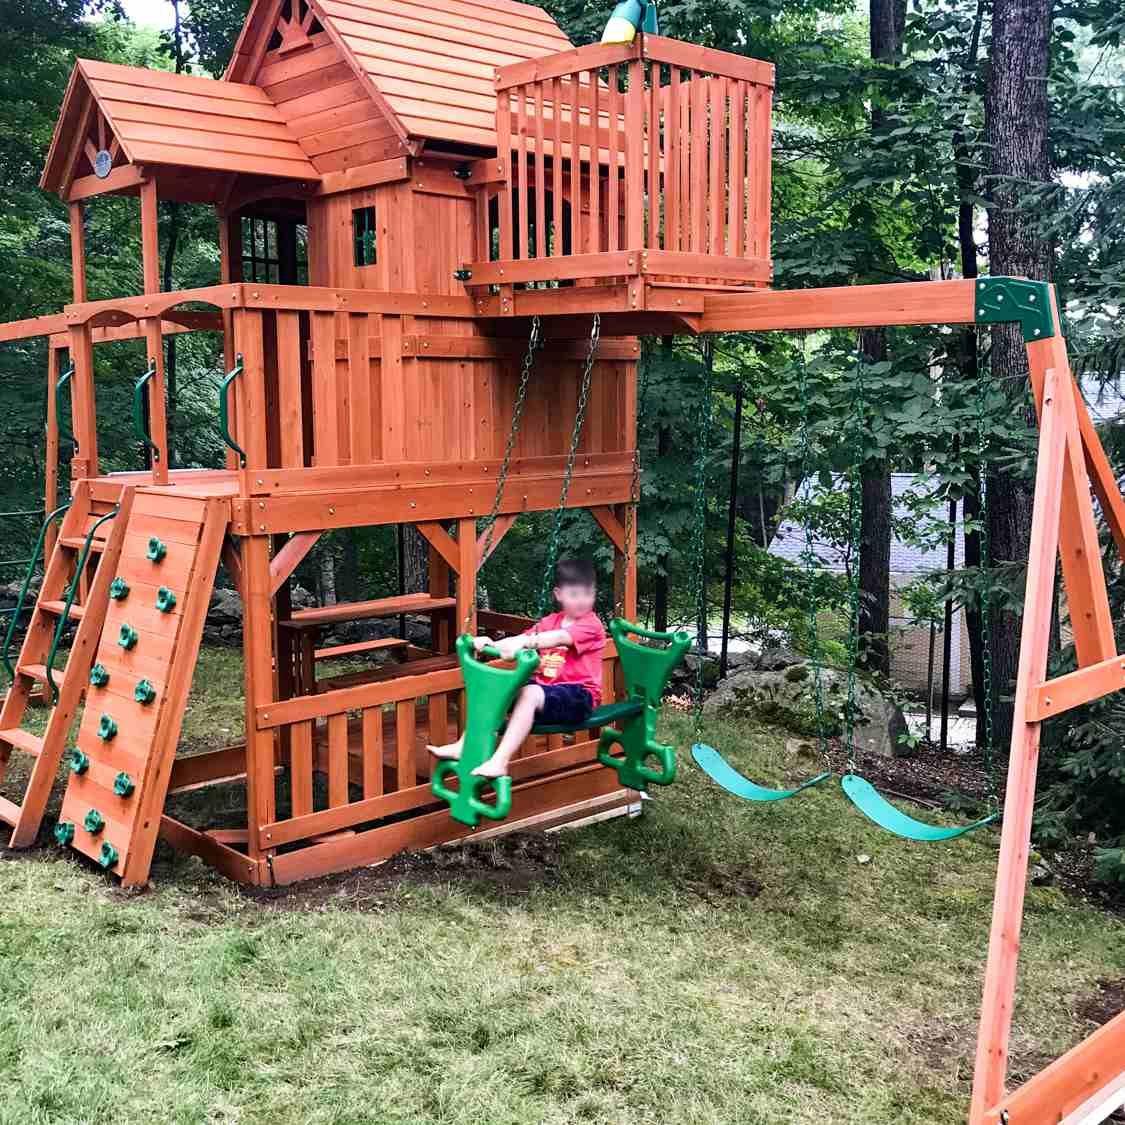 Impressive Backyard Jungle Gym Ideas Jungle Gyms Permit Children To Interact And Communicate Wi Wooden Playground Equipment Wooden Playground Backyard Playset